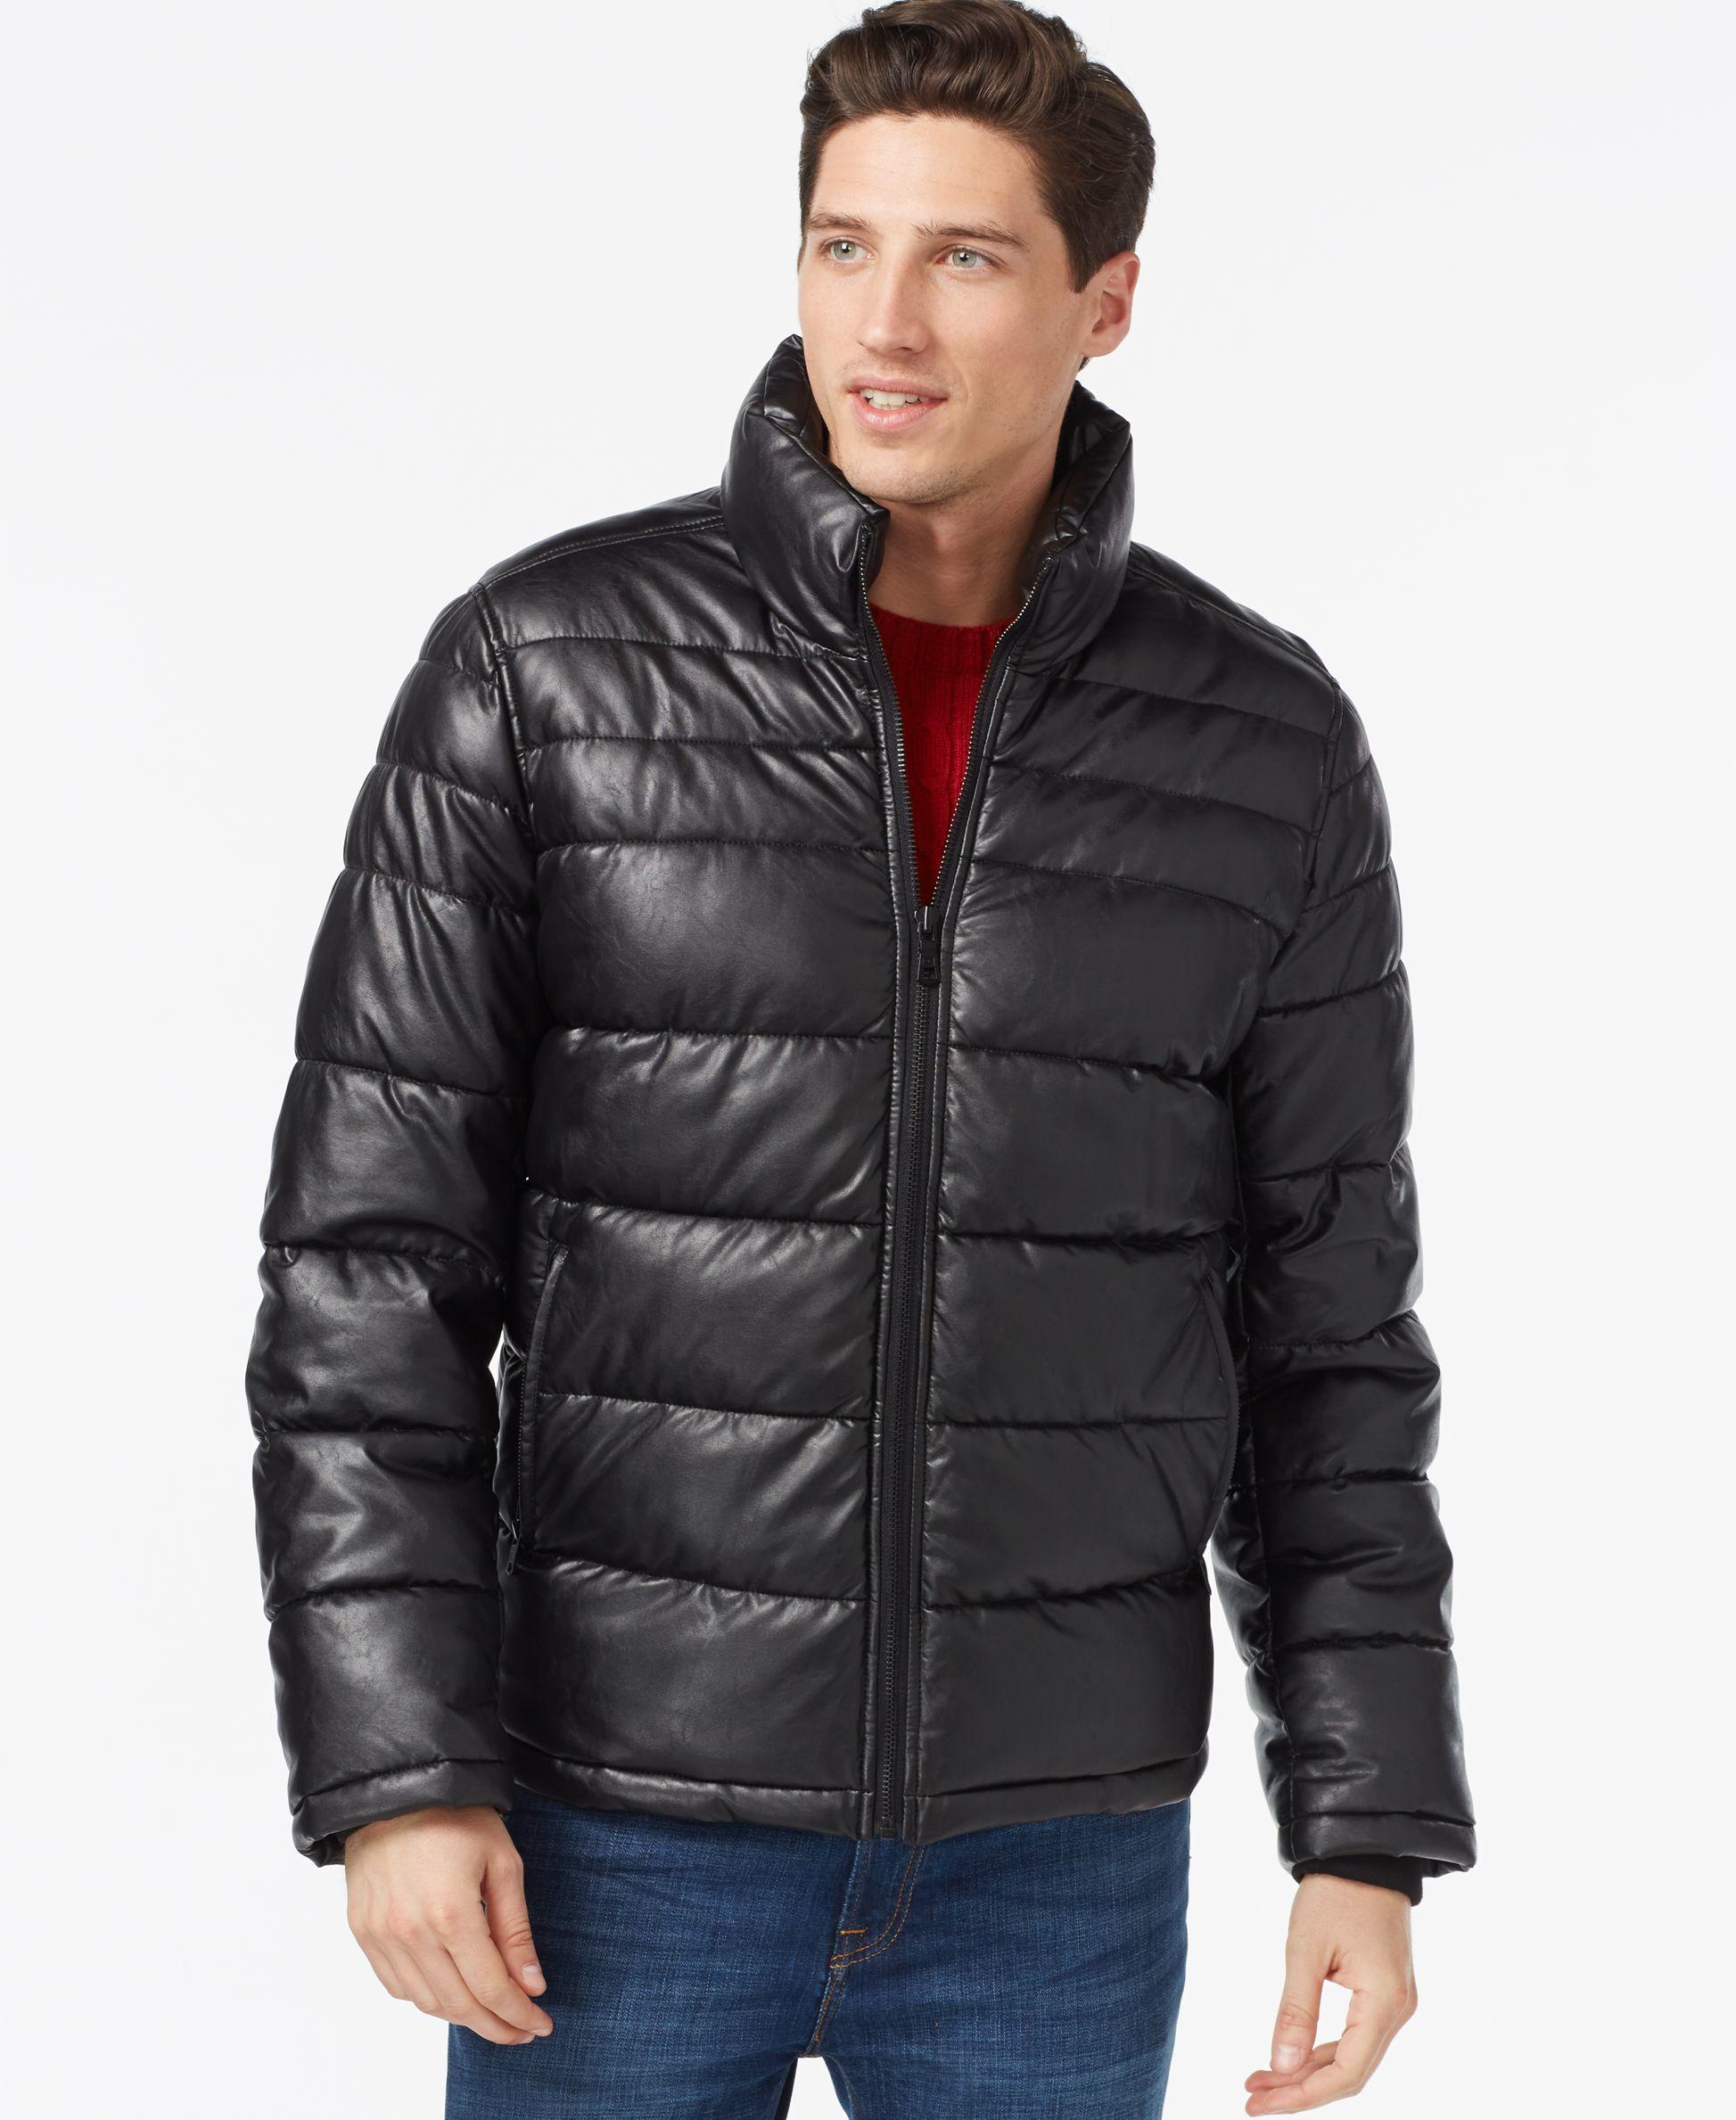 tommy hilfiger faux leather quilted jacket in black for men lyst. Black Bedroom Furniture Sets. Home Design Ideas